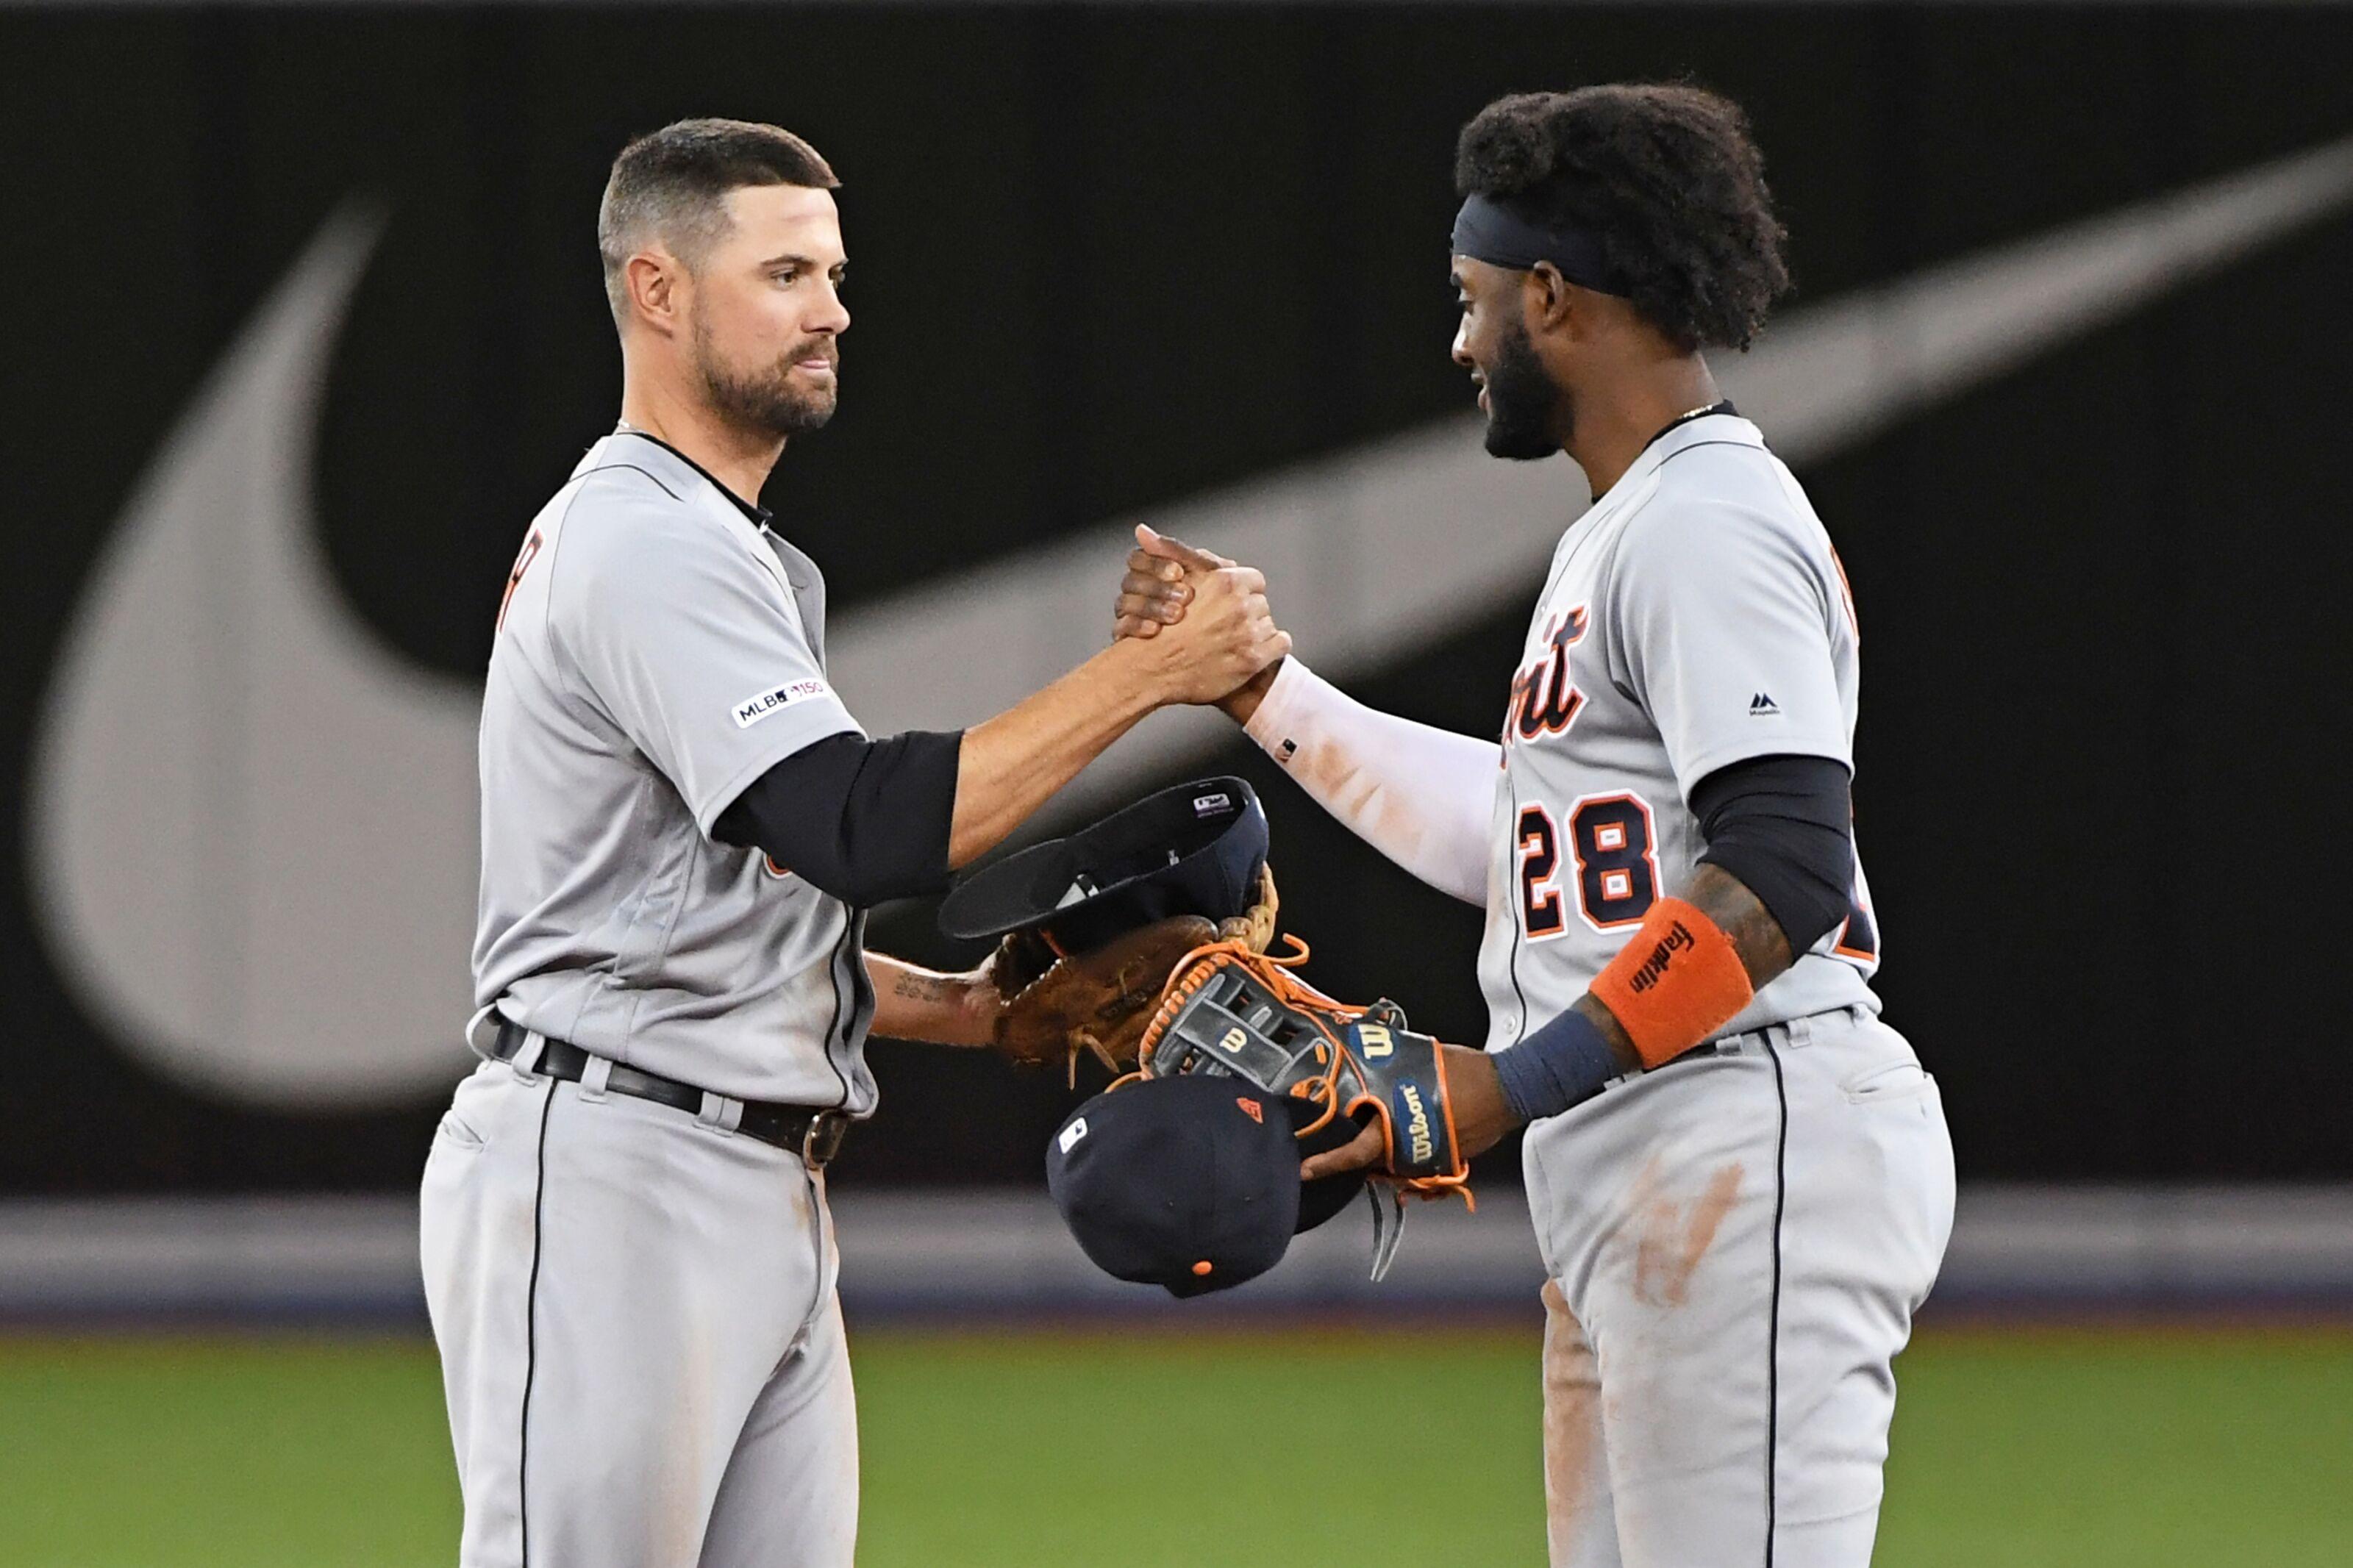 Detroit Tigers: Three takeaways from Blue Jays series